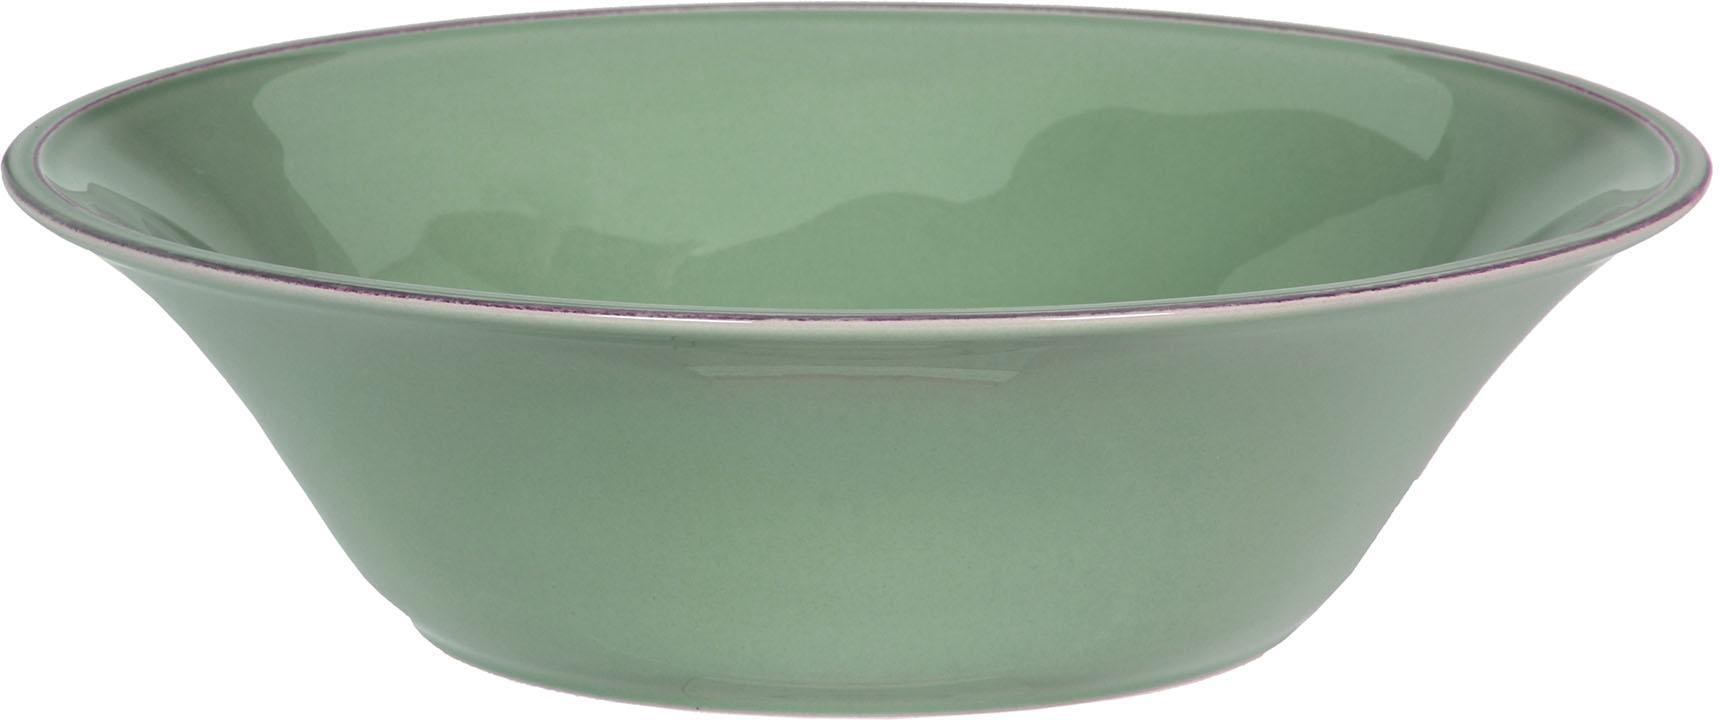 Ensaladera Constance, estilo rústico, Cerámica, Verde salvia, Ø 30 x Al 9 cm